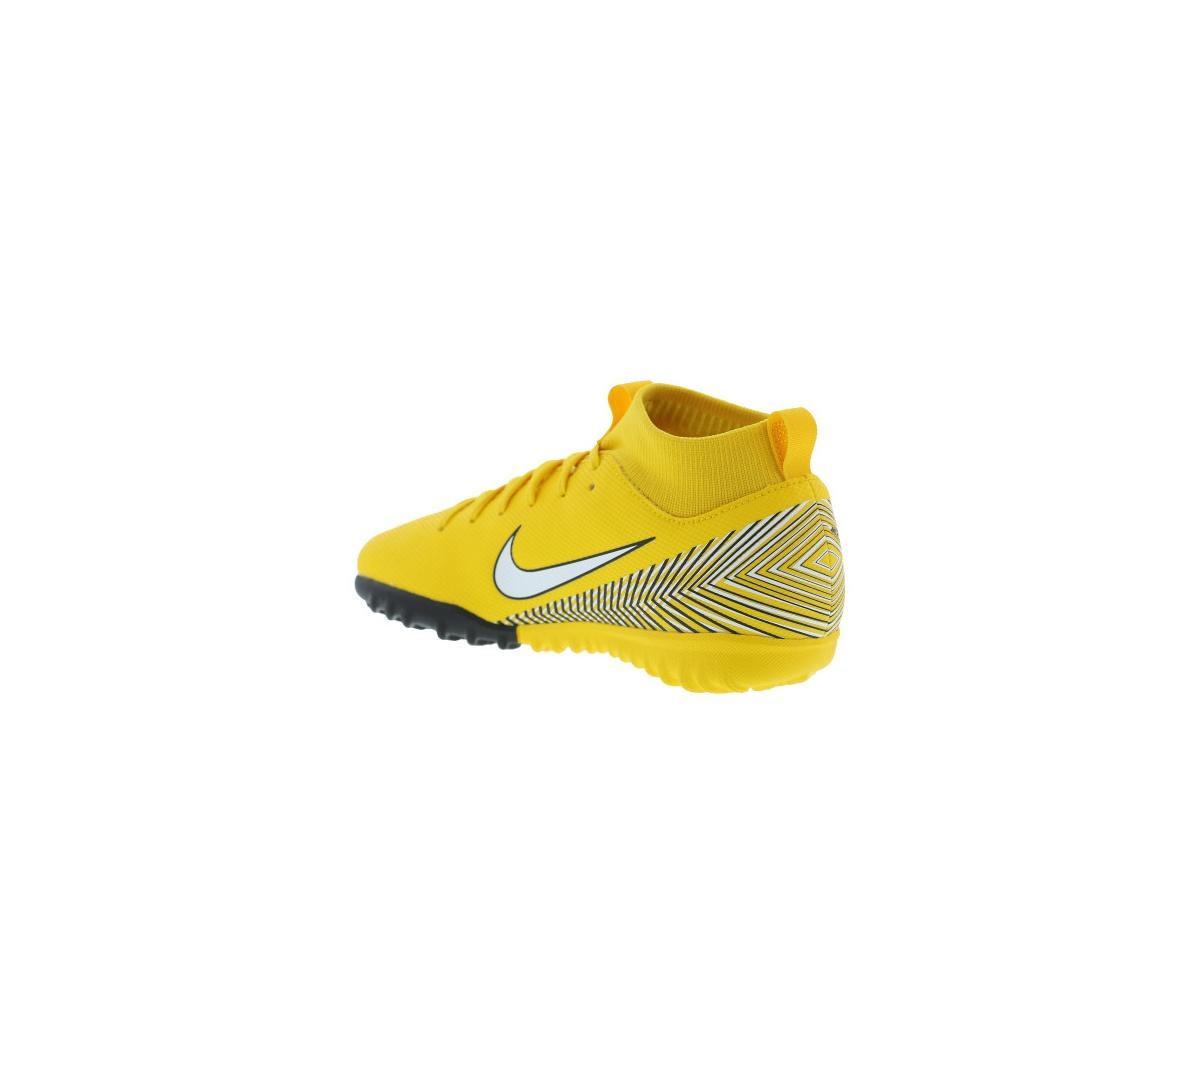 Chuteira Nike Superfly Academy NJR TF Infantil.